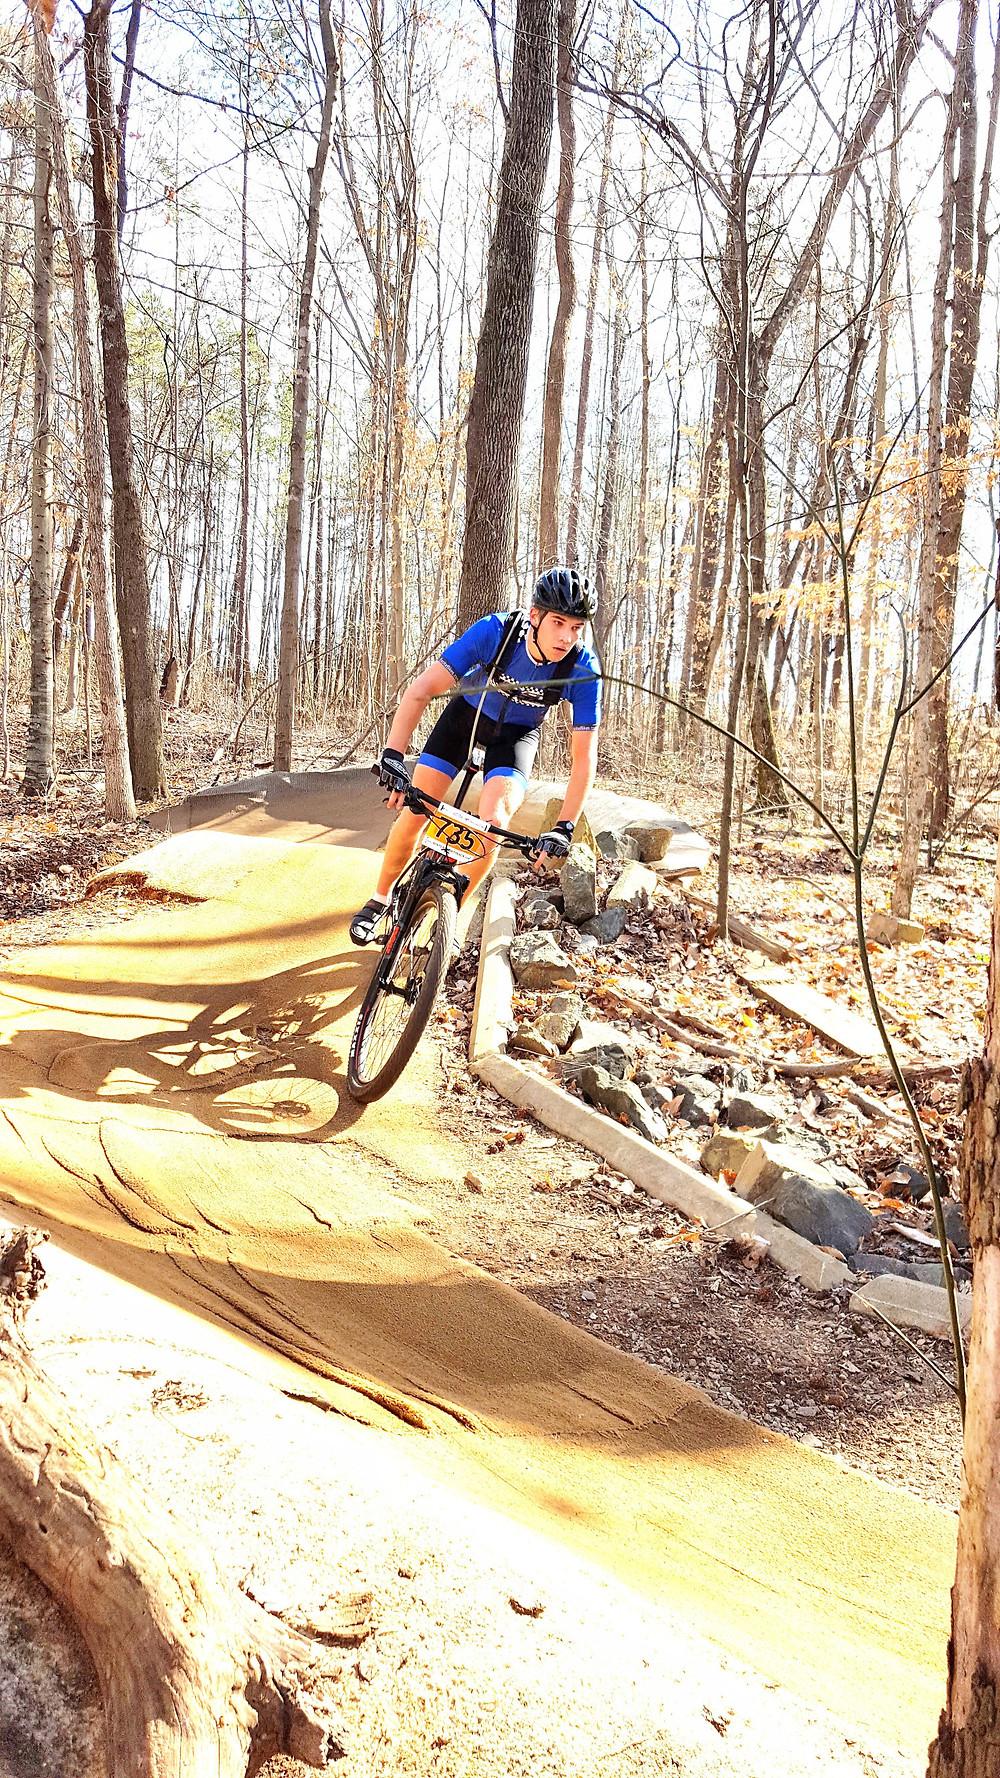 person riding mountain bike